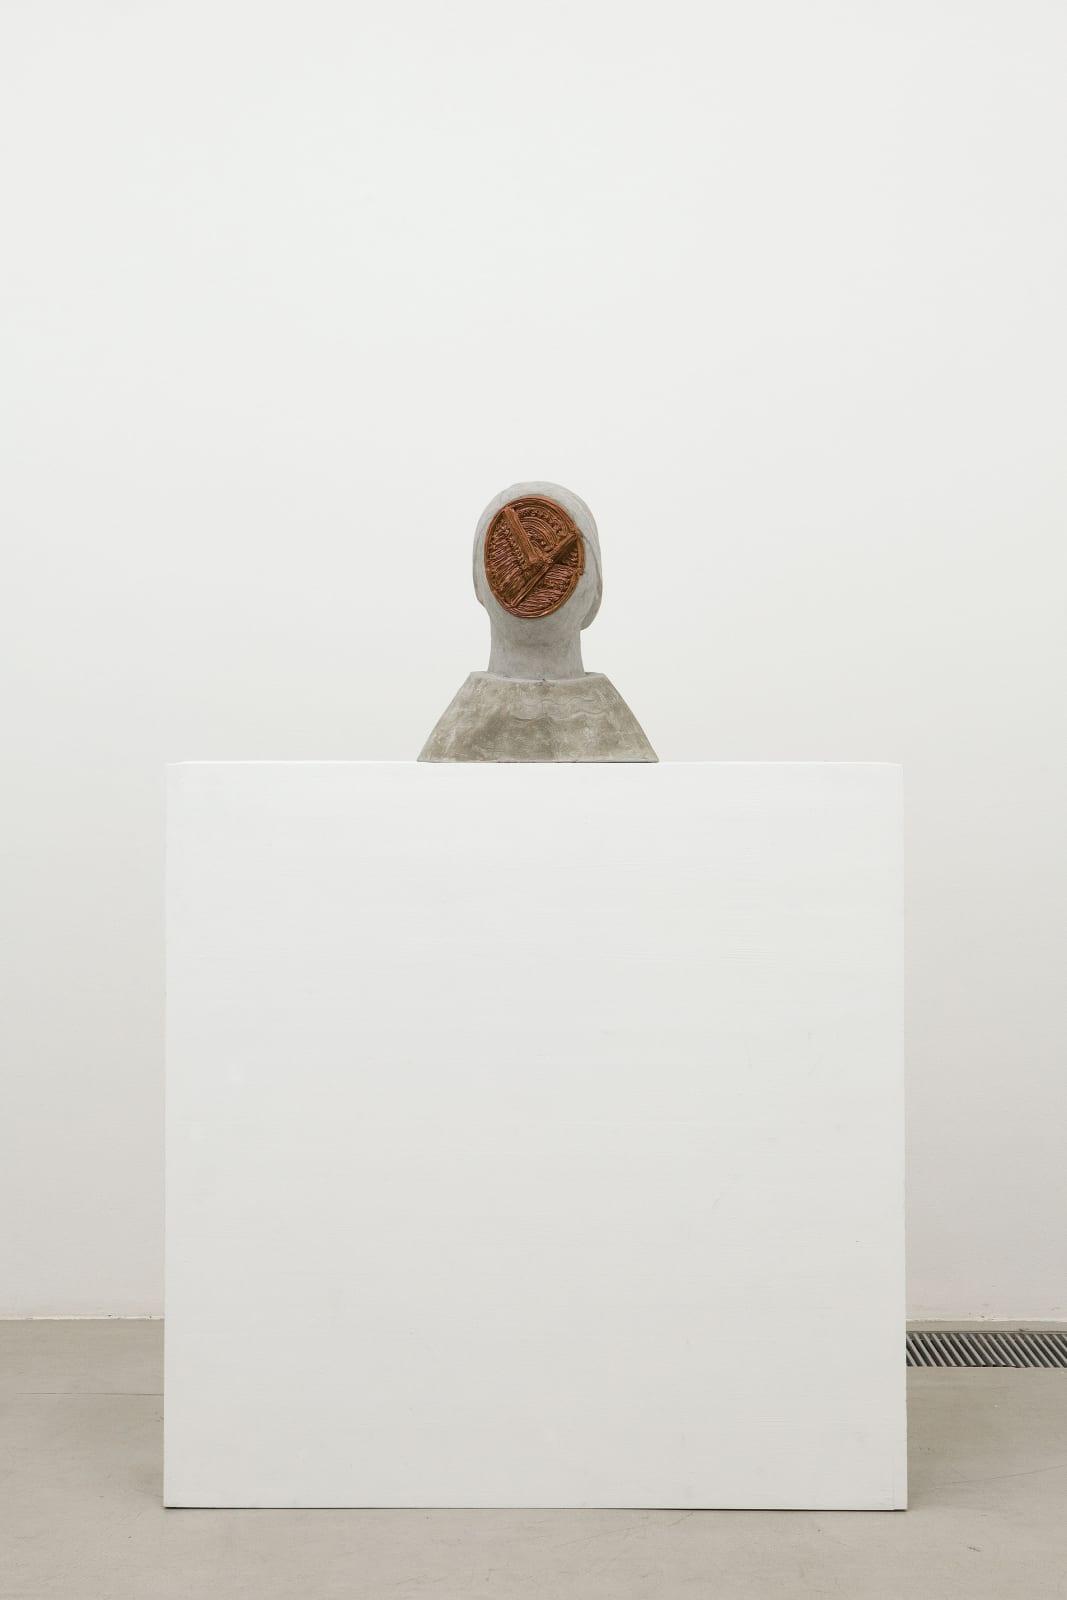 Anna Hulacova, Untitled, 2017, concrete, acrylic filler, 39 x 33 x 25 cm